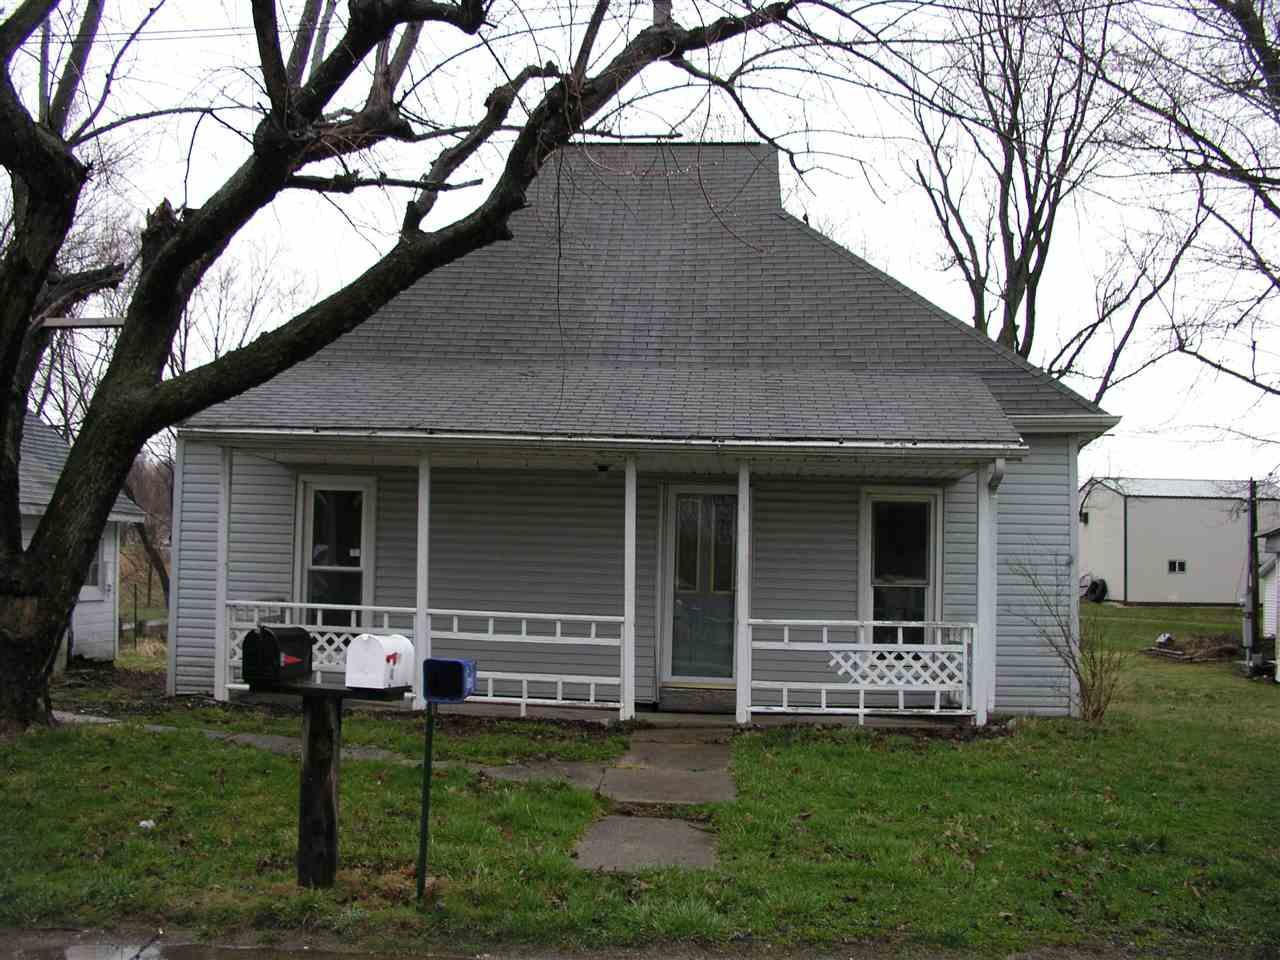 Real Estate for Sale, ListingId: 32515682, Bedford,IN47421